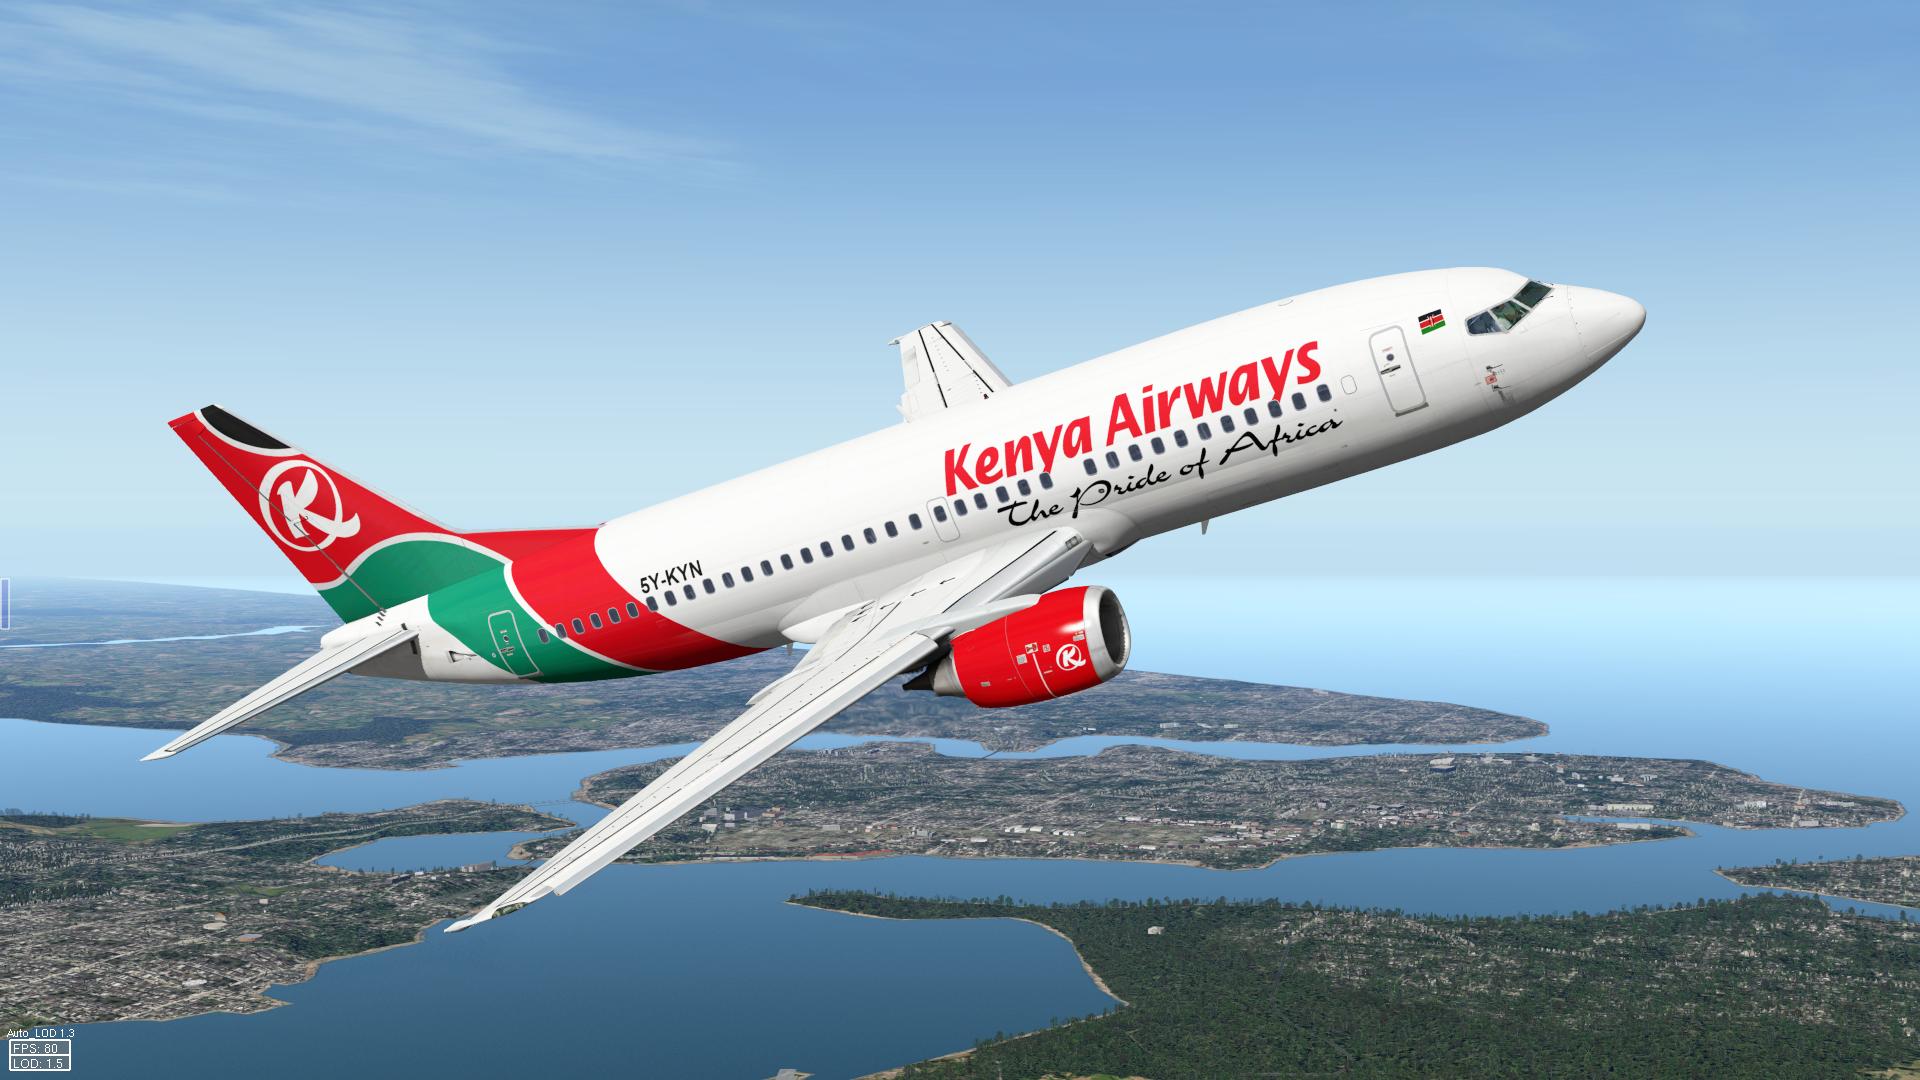 Kenya Airways Launch Us Flights To Africa Malawi Tourism